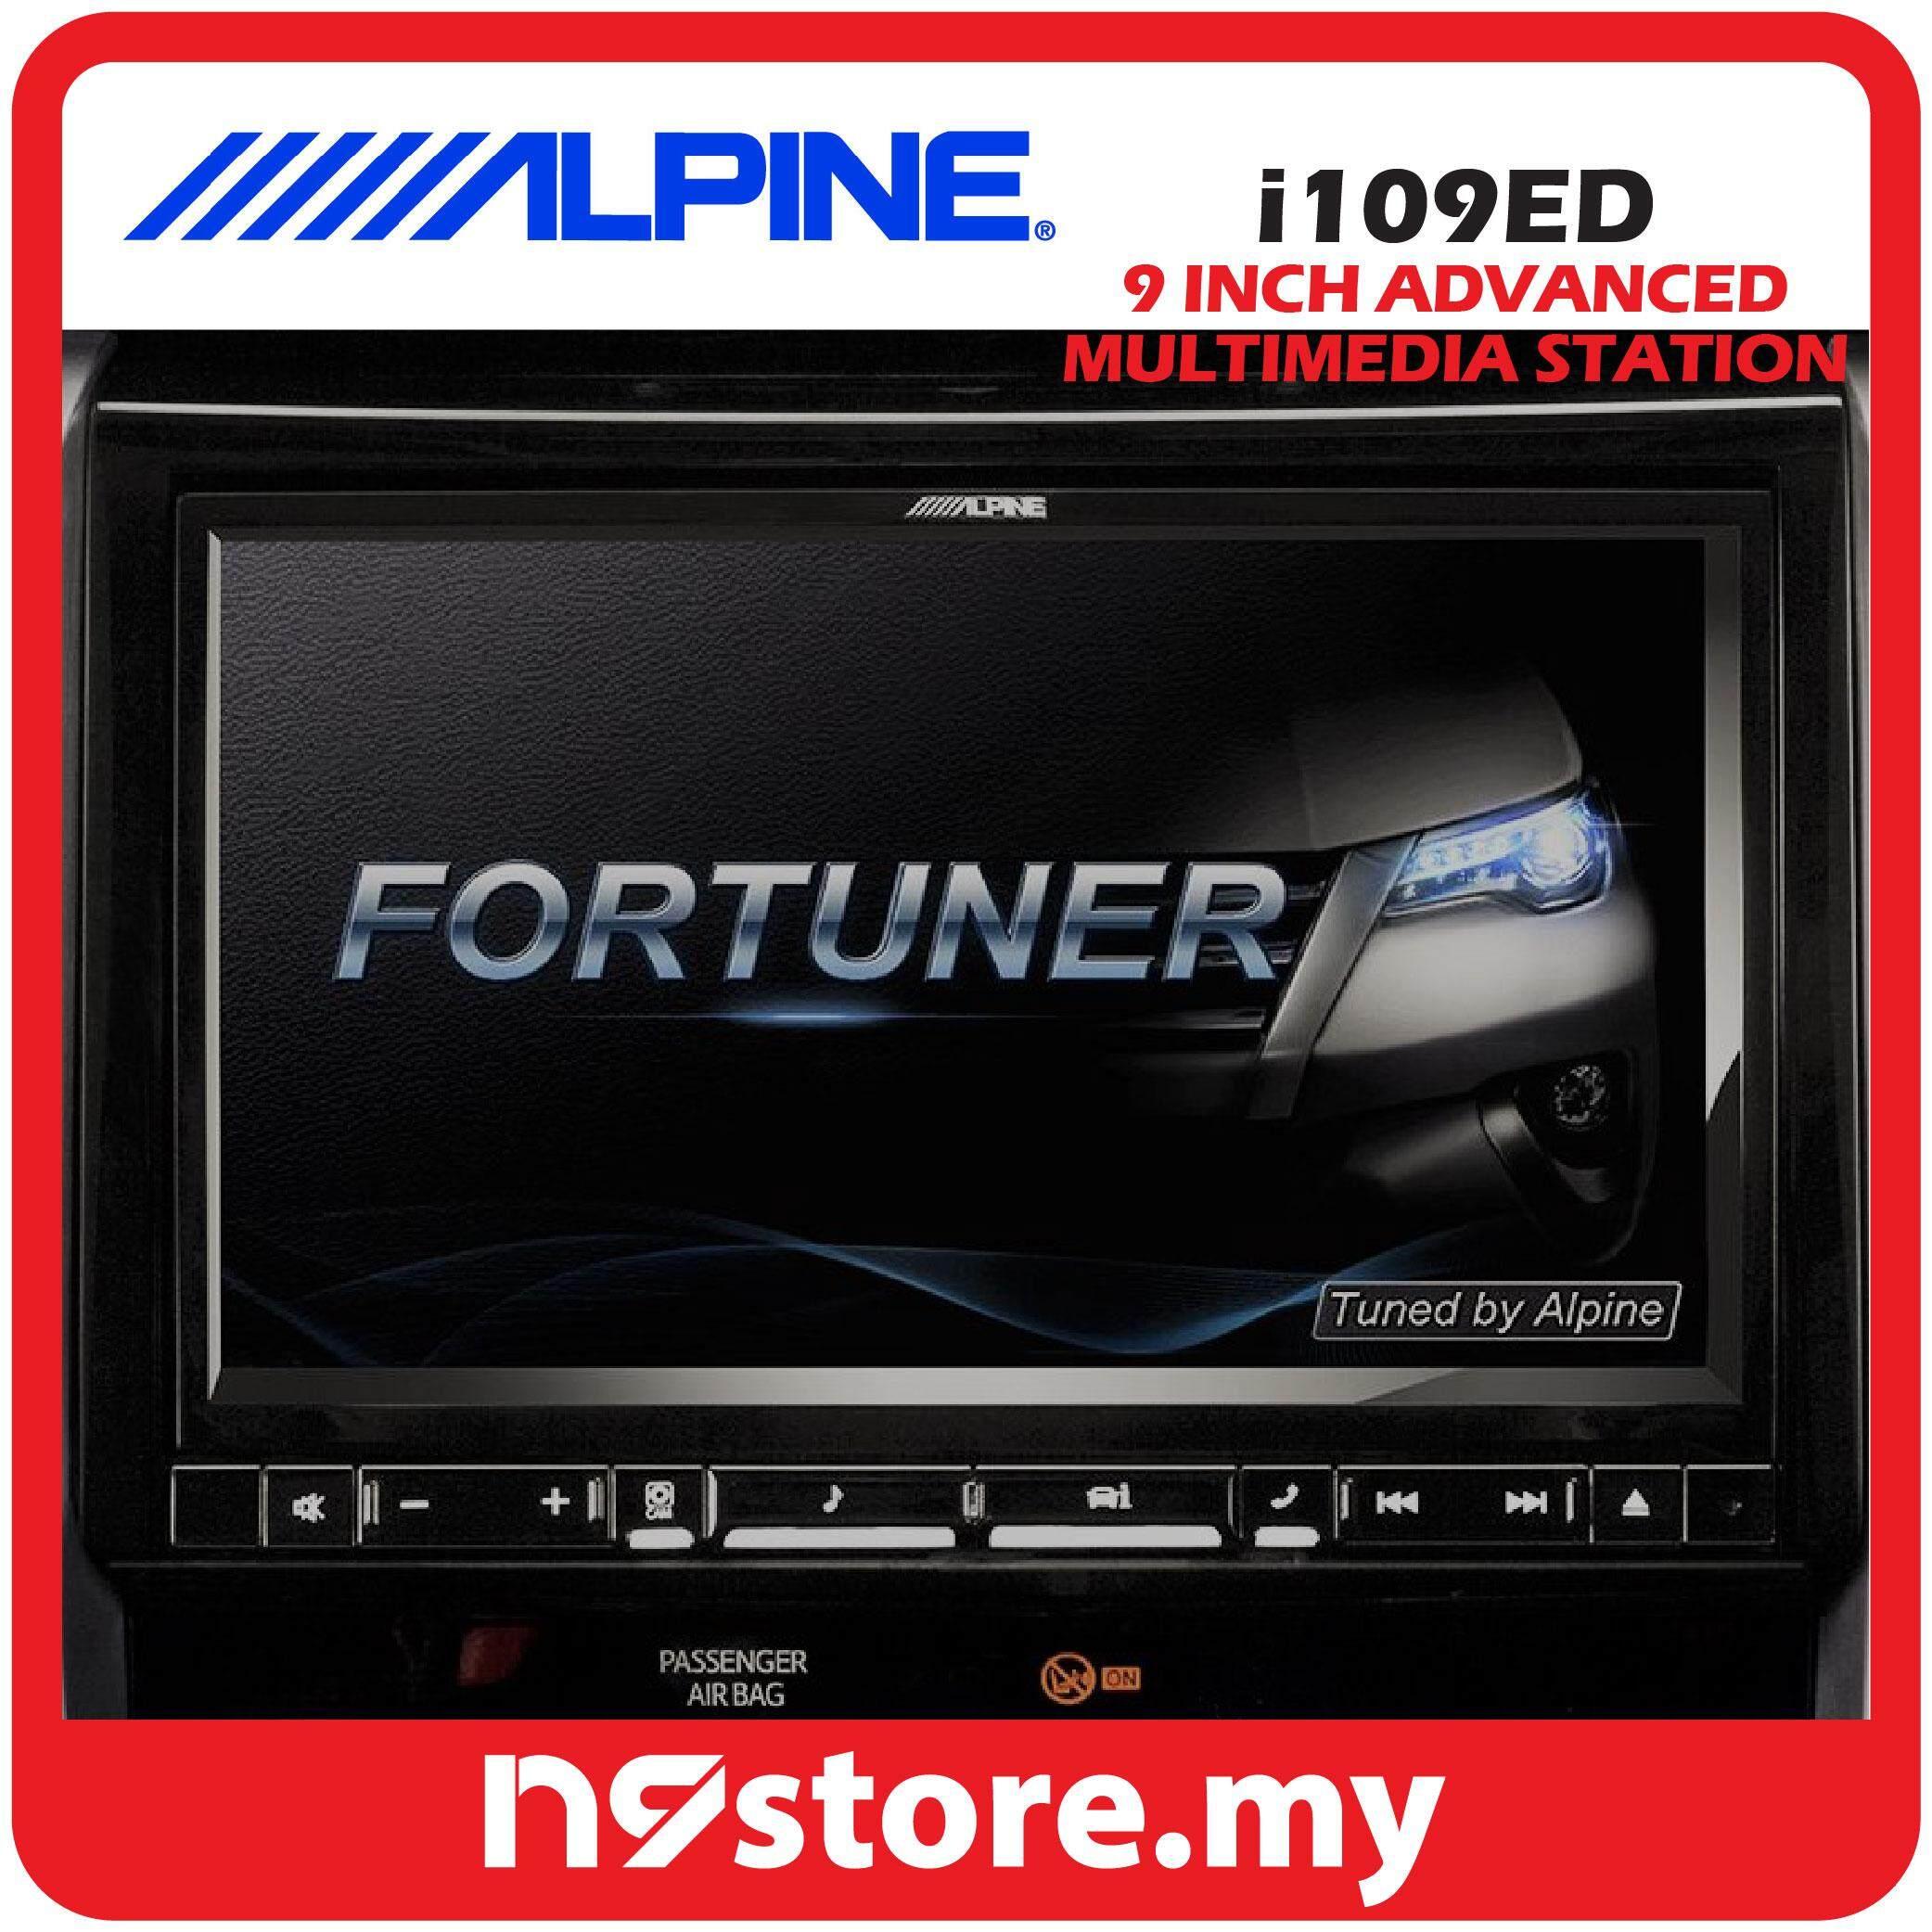 "Alpine i109ED 9"" Touch Screen LED/WVGA display Advance Multimedia Station"